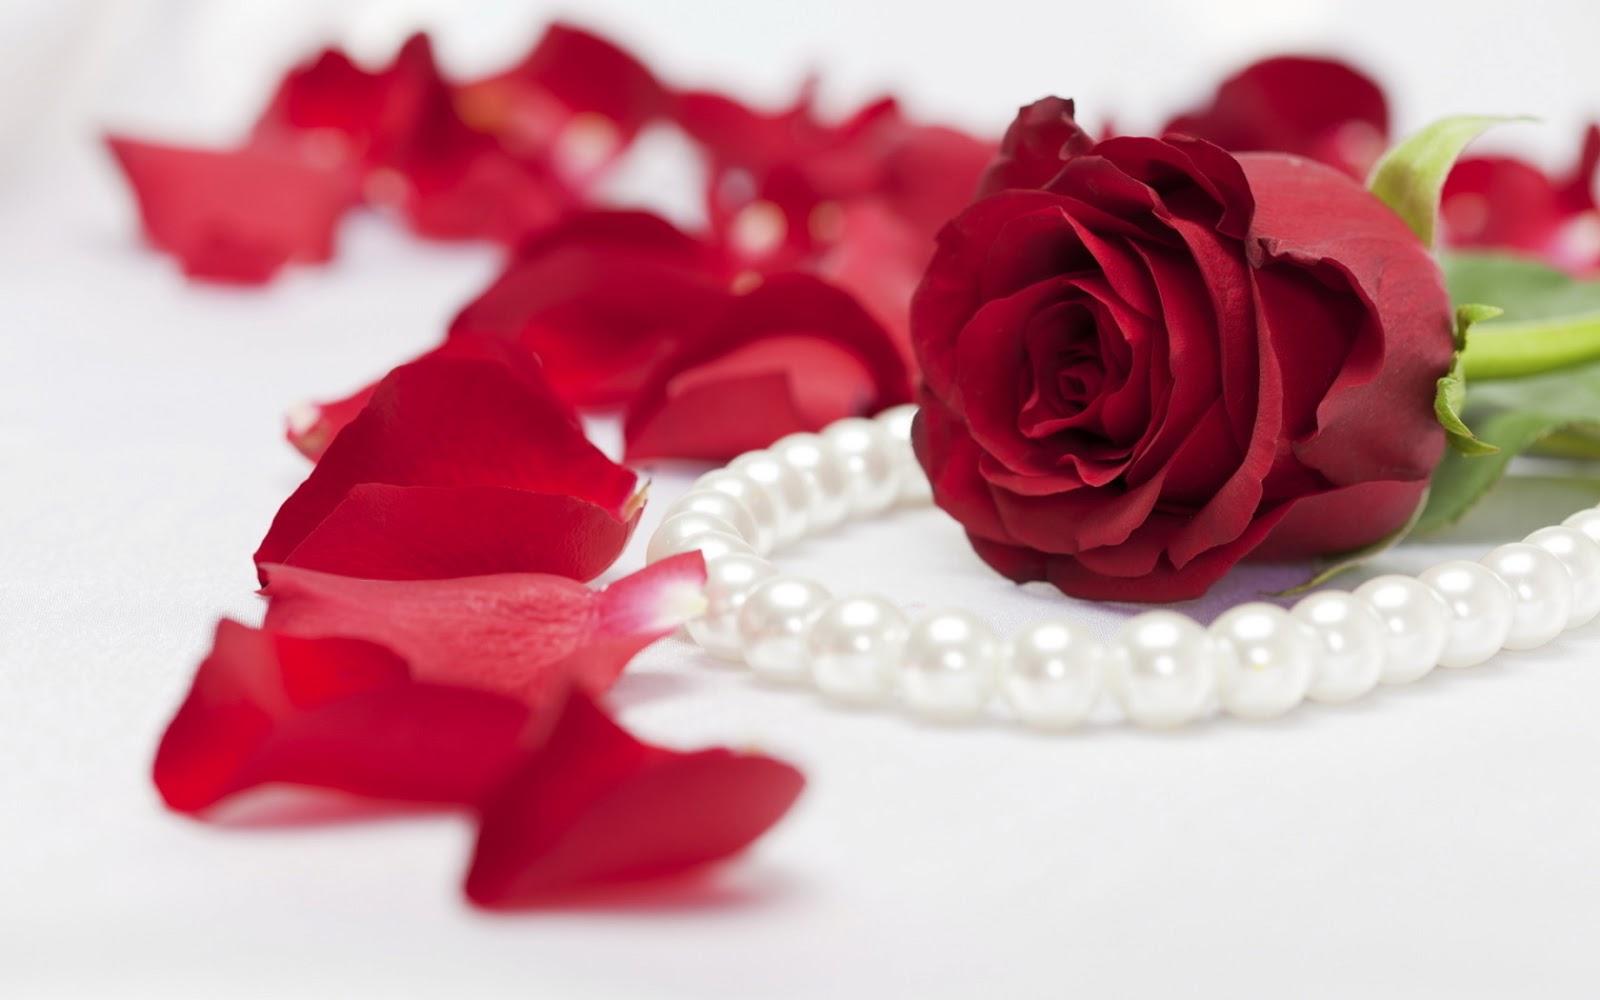 rose flowers - thumbgal